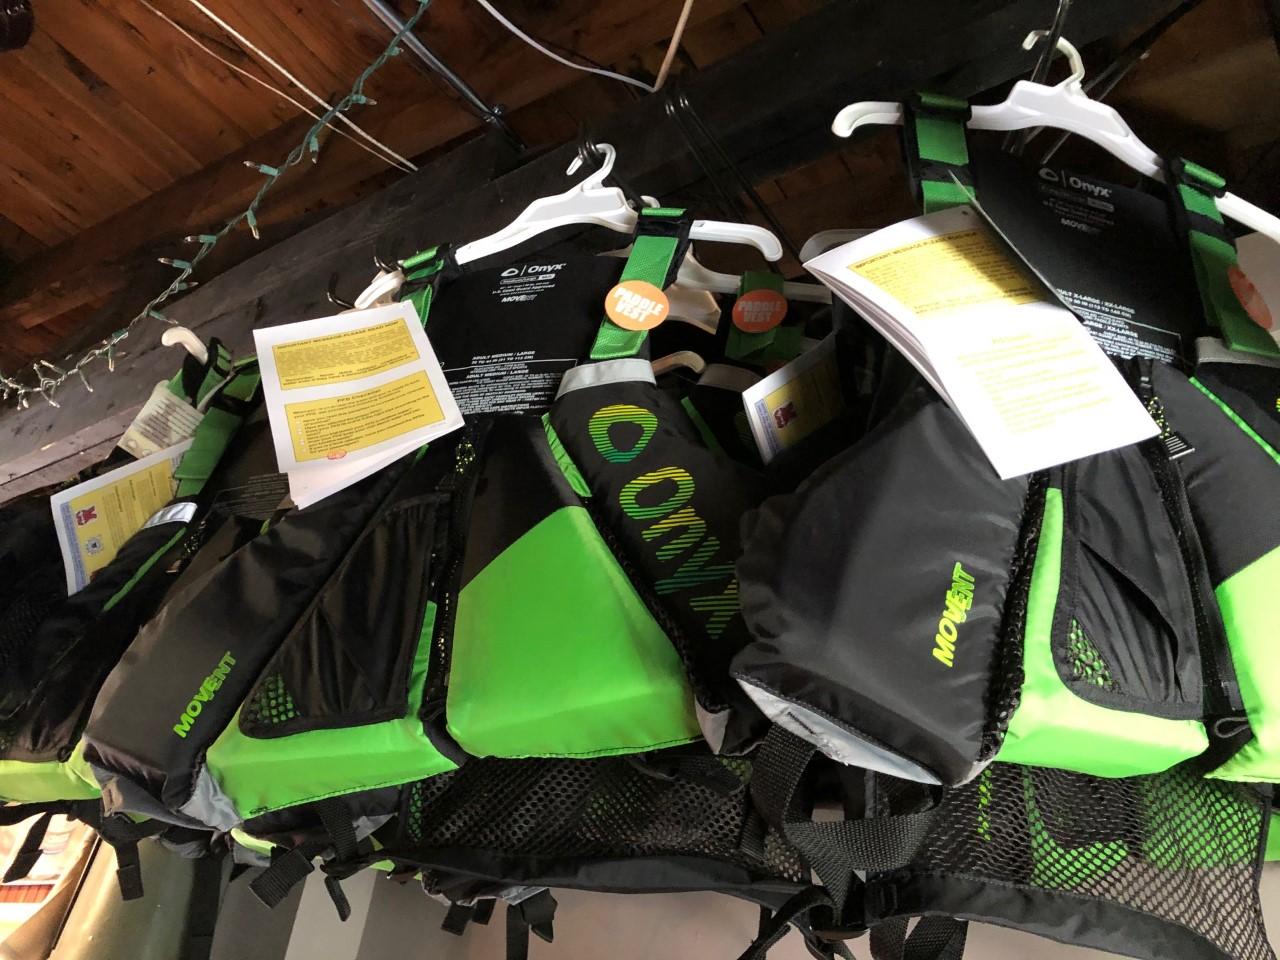 Onyx Paddle Vest PFD  Green M/l